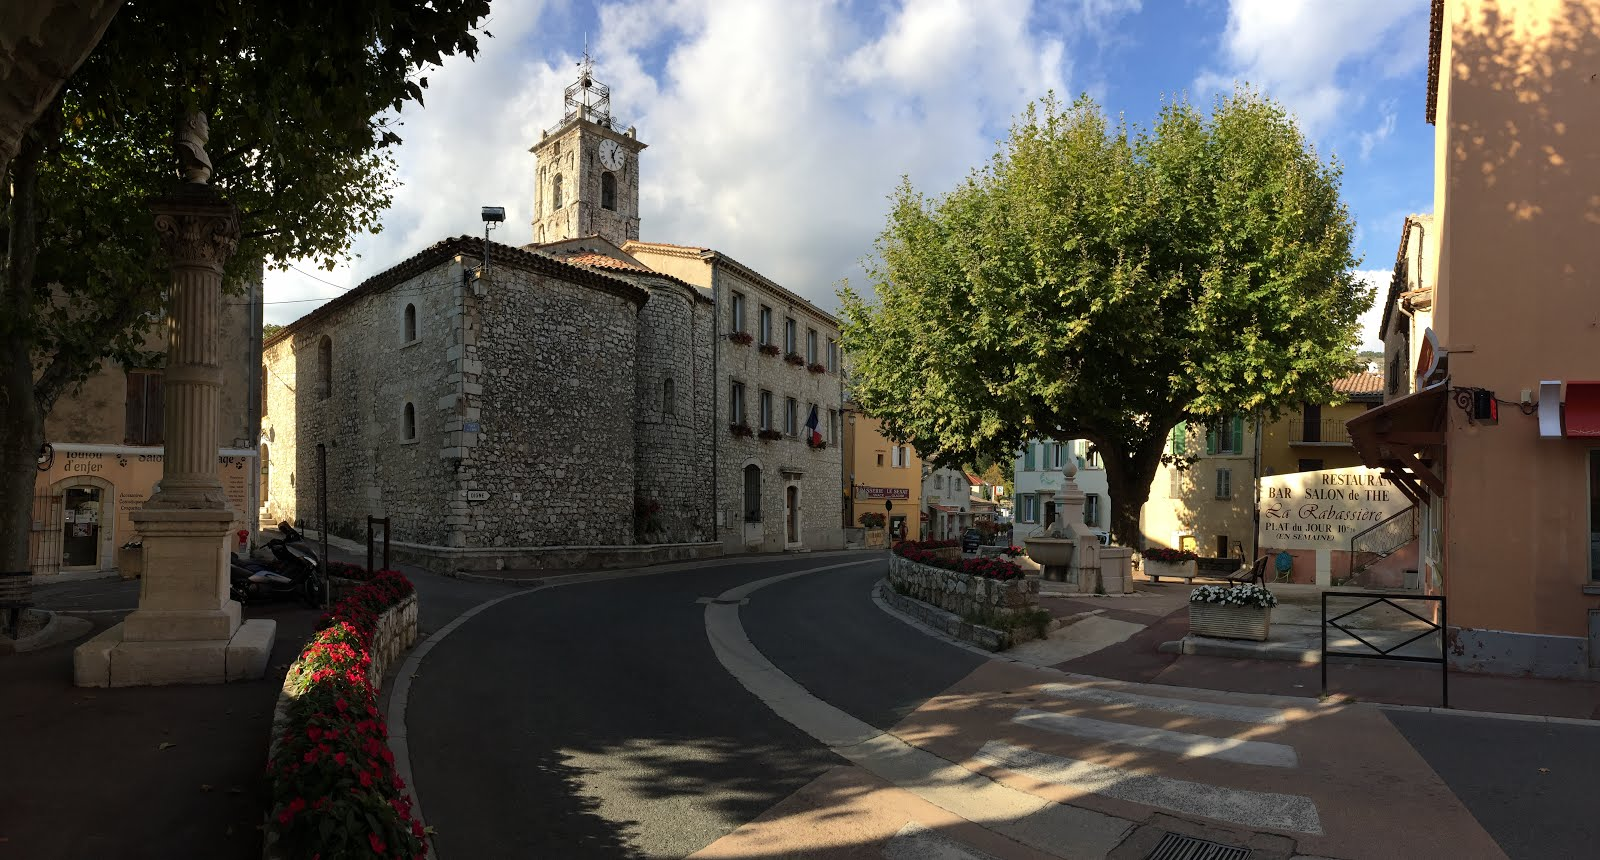 St.-Vallier-de-Thiey